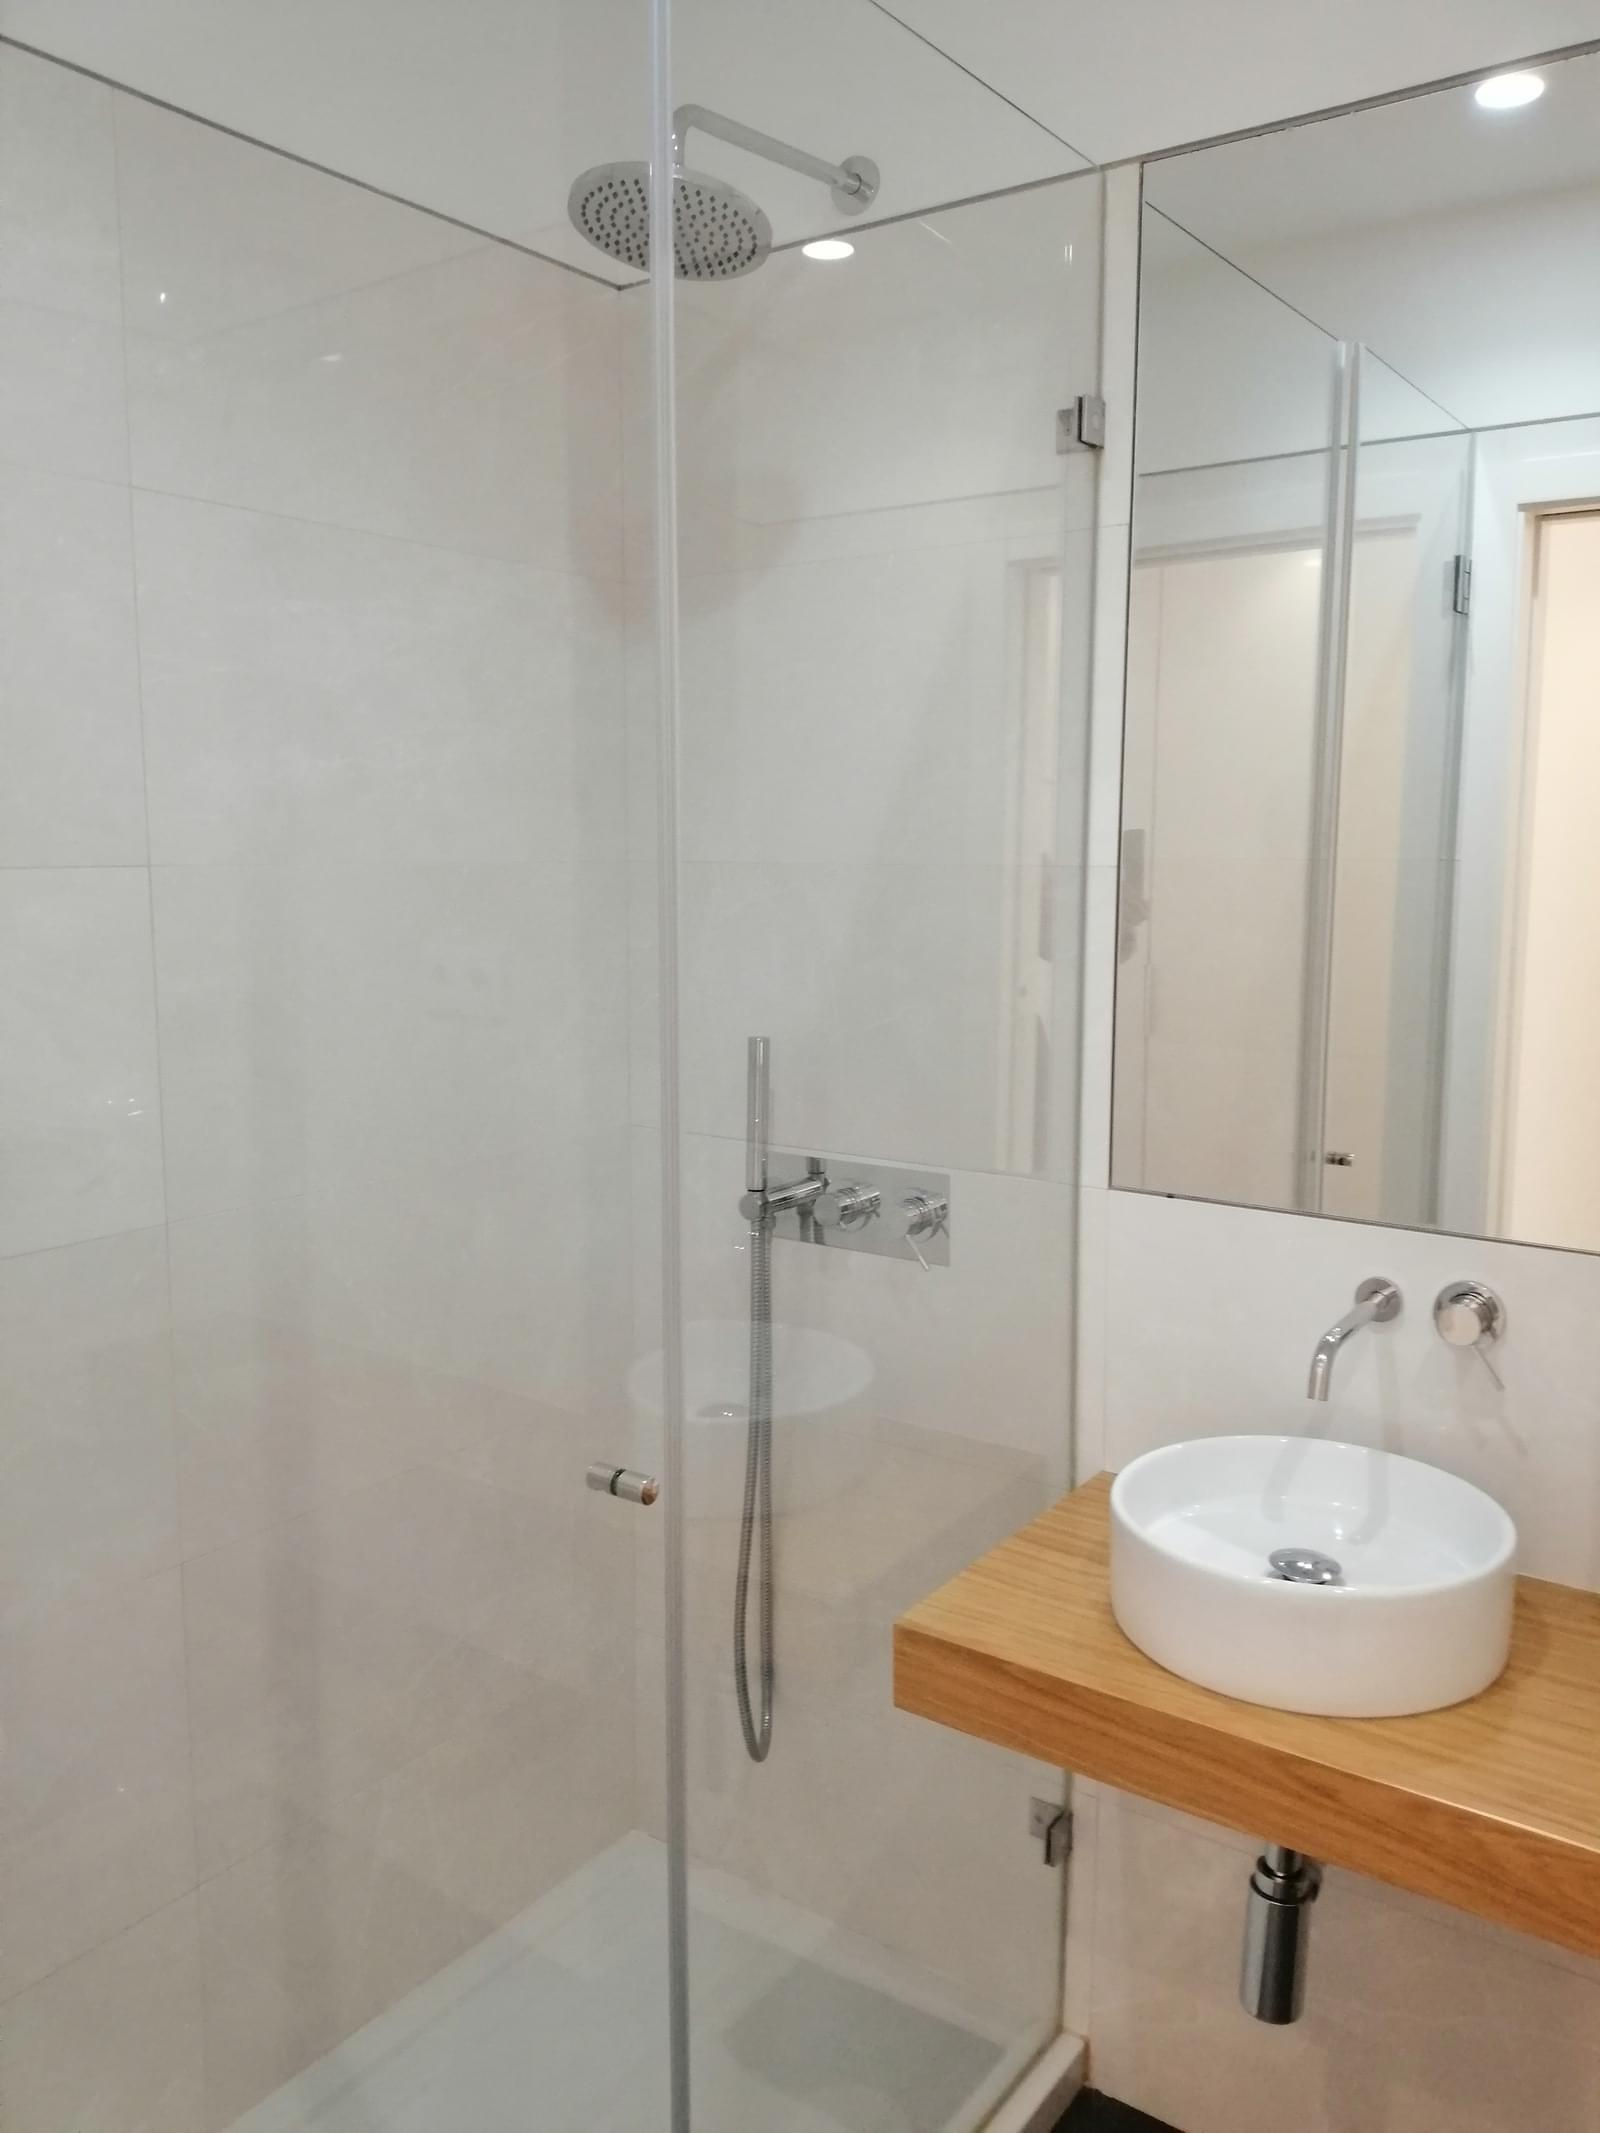 pf18996-apartamento-t3-lisboa-4ab5cdfe-fc87-4849-bf25-34afee263539